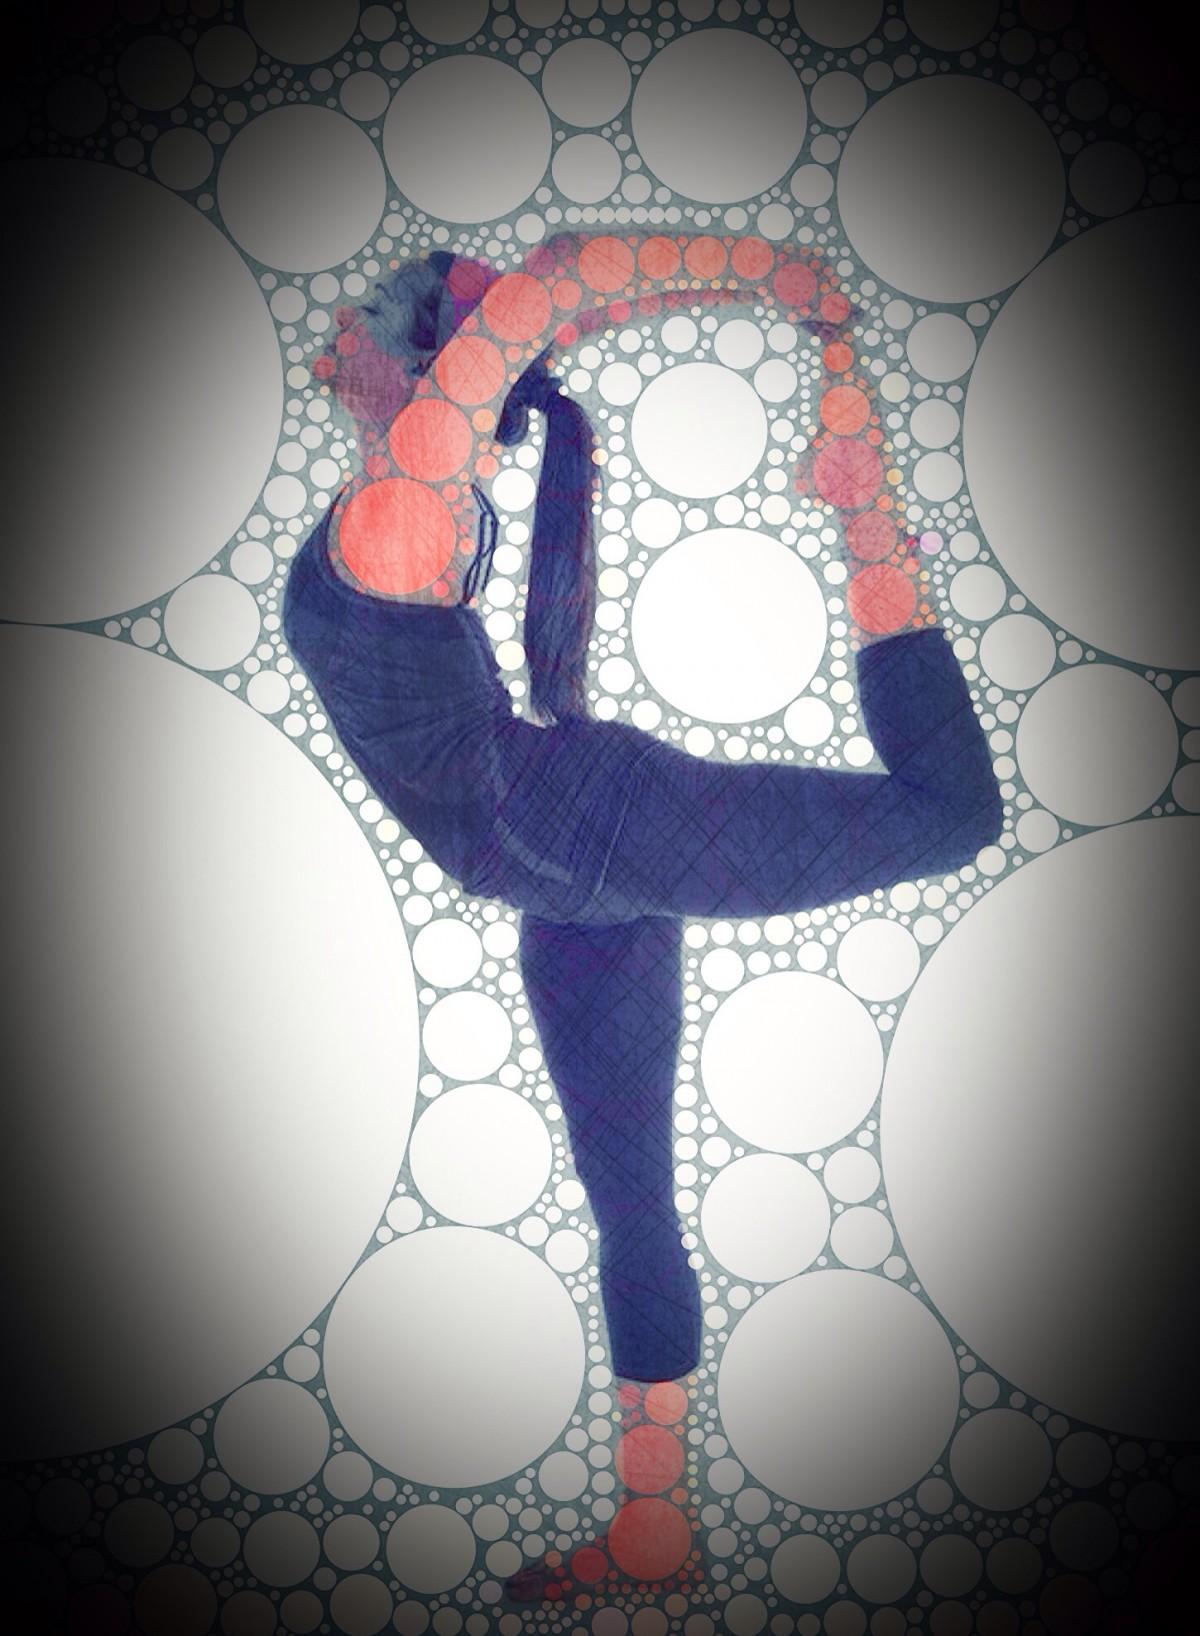 yoga-art-13-john-dalton.JPG